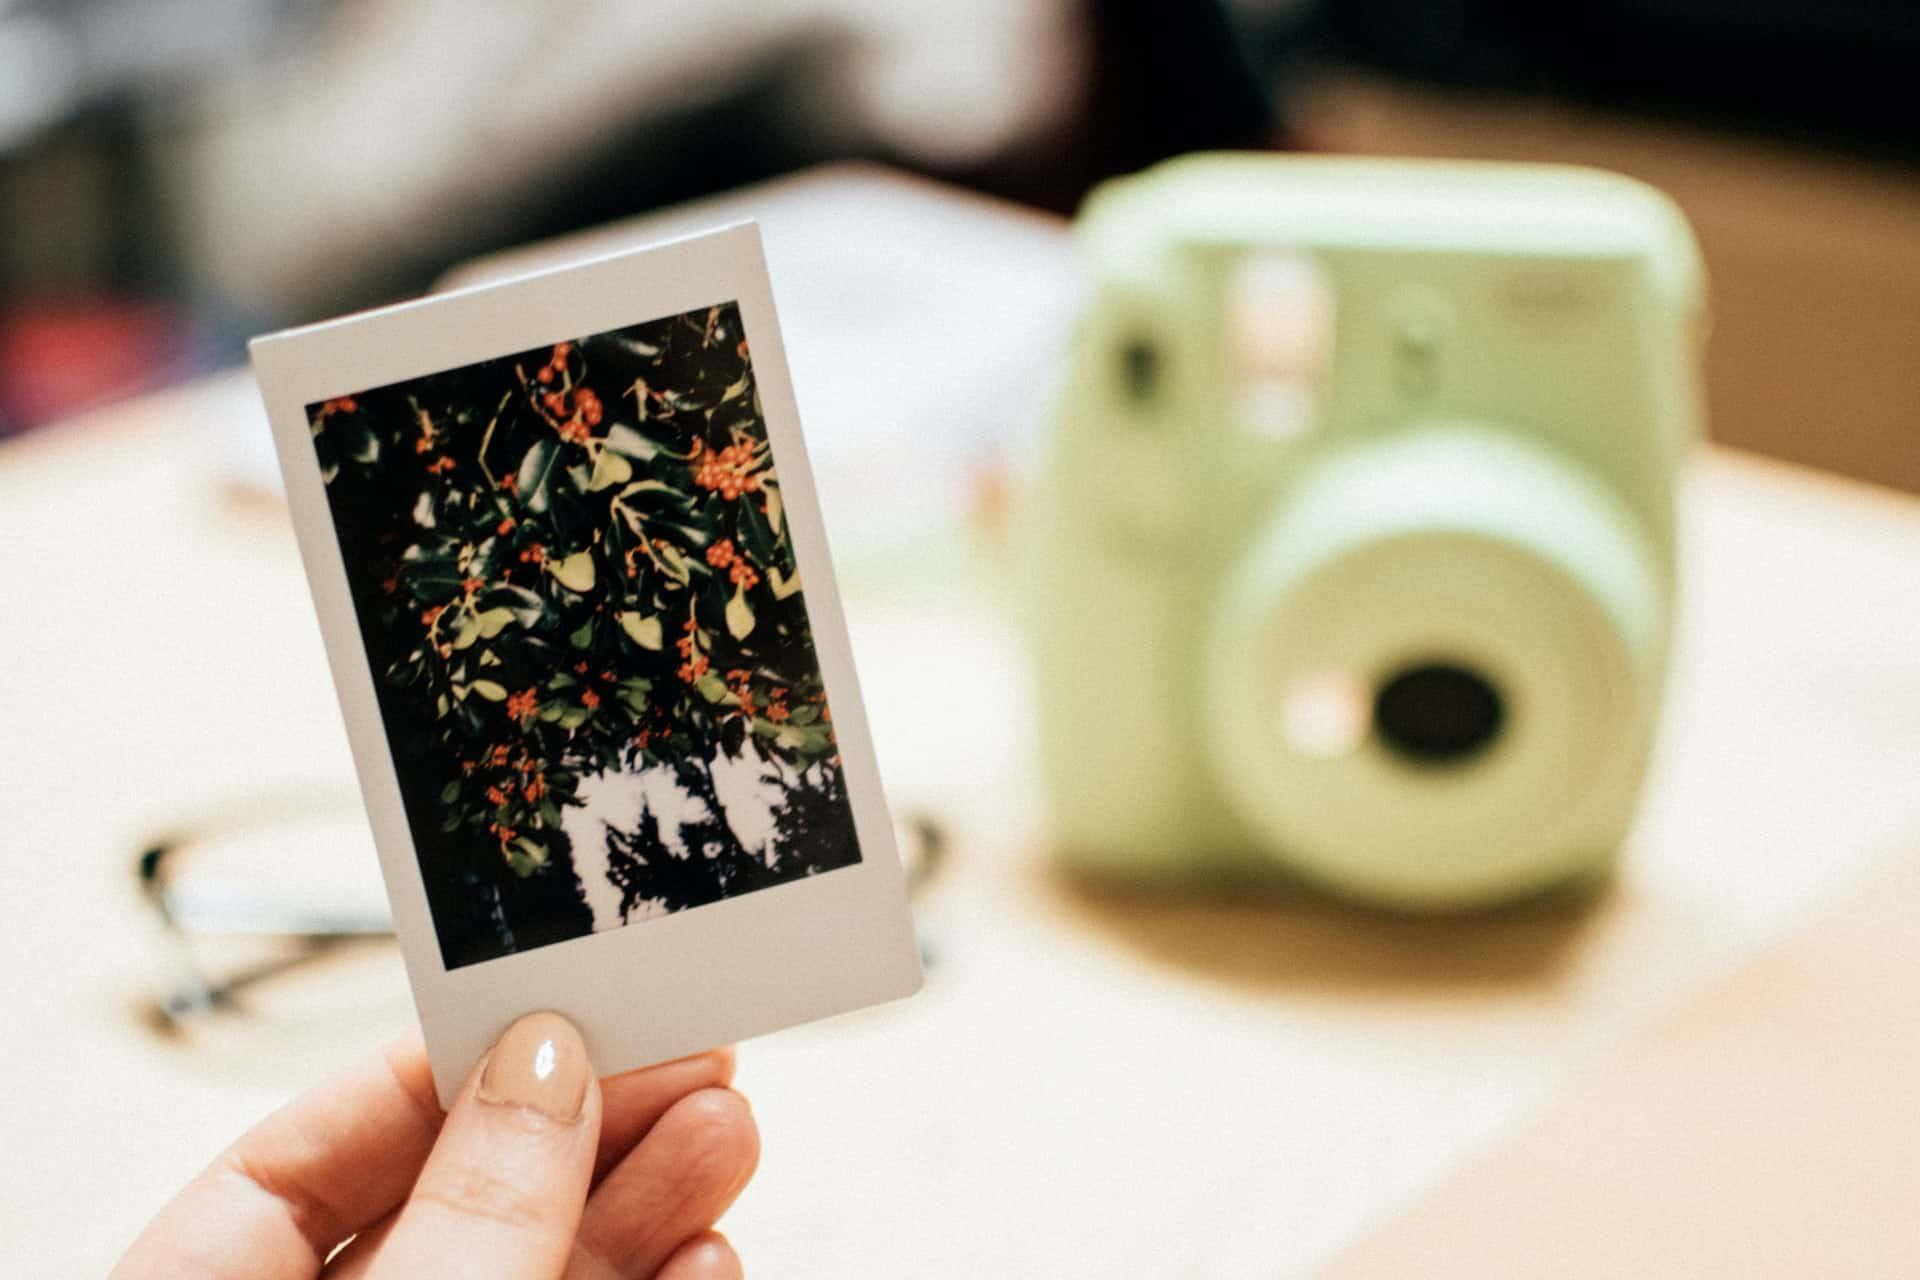 Polaroid digital photo frames